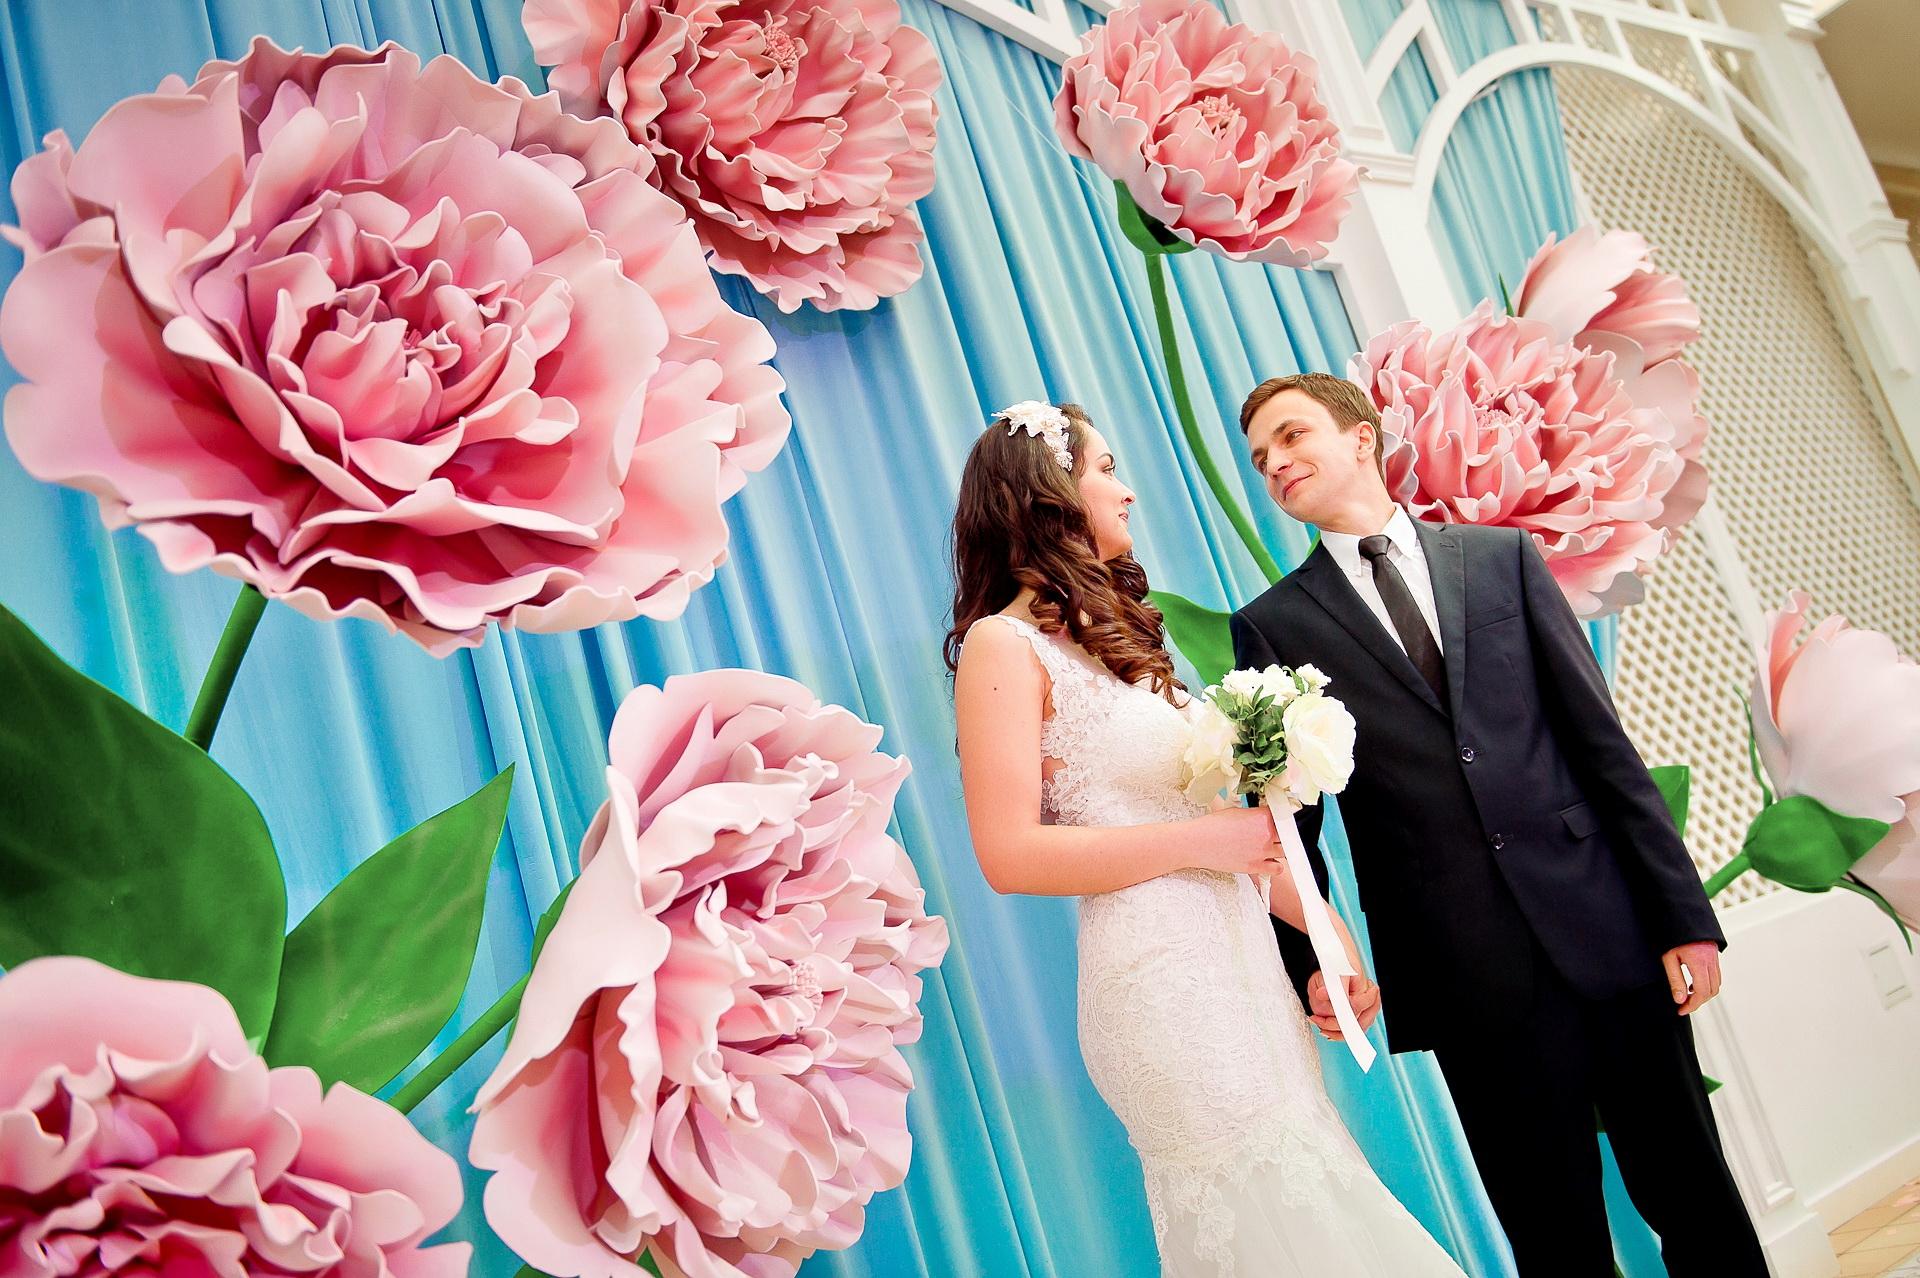 серенити и розовый кварц. Свадьба